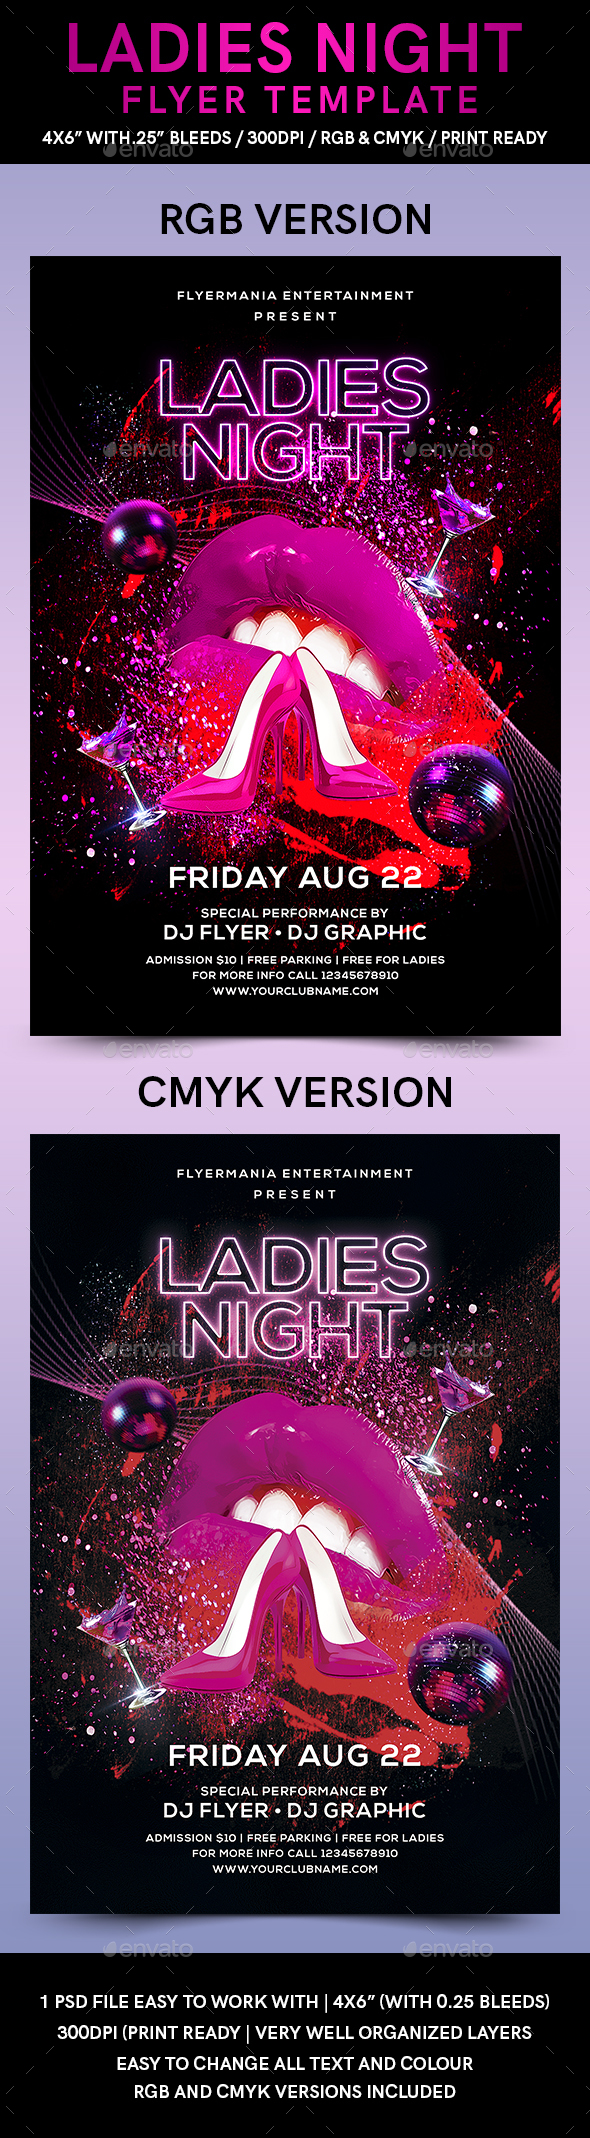 Ladies Night Flyer Template - Flyers Print Templates